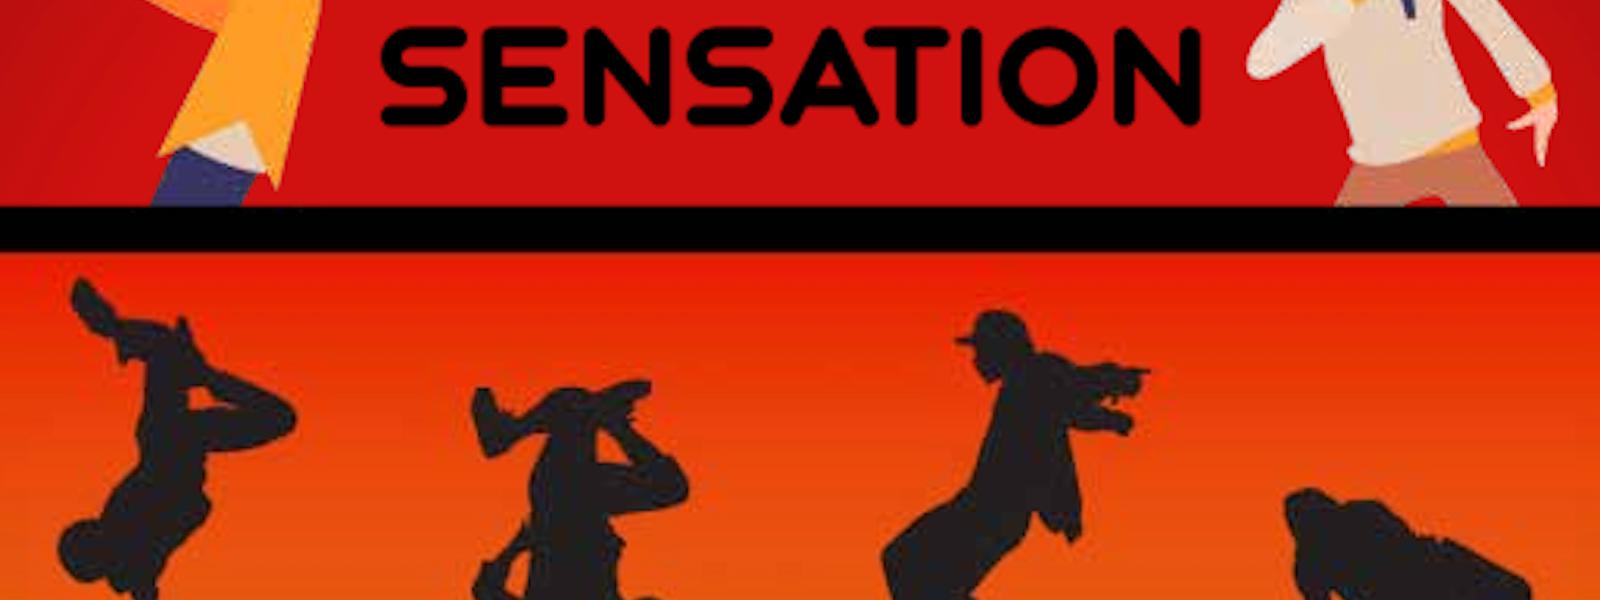 Bild - Beatbox sensation